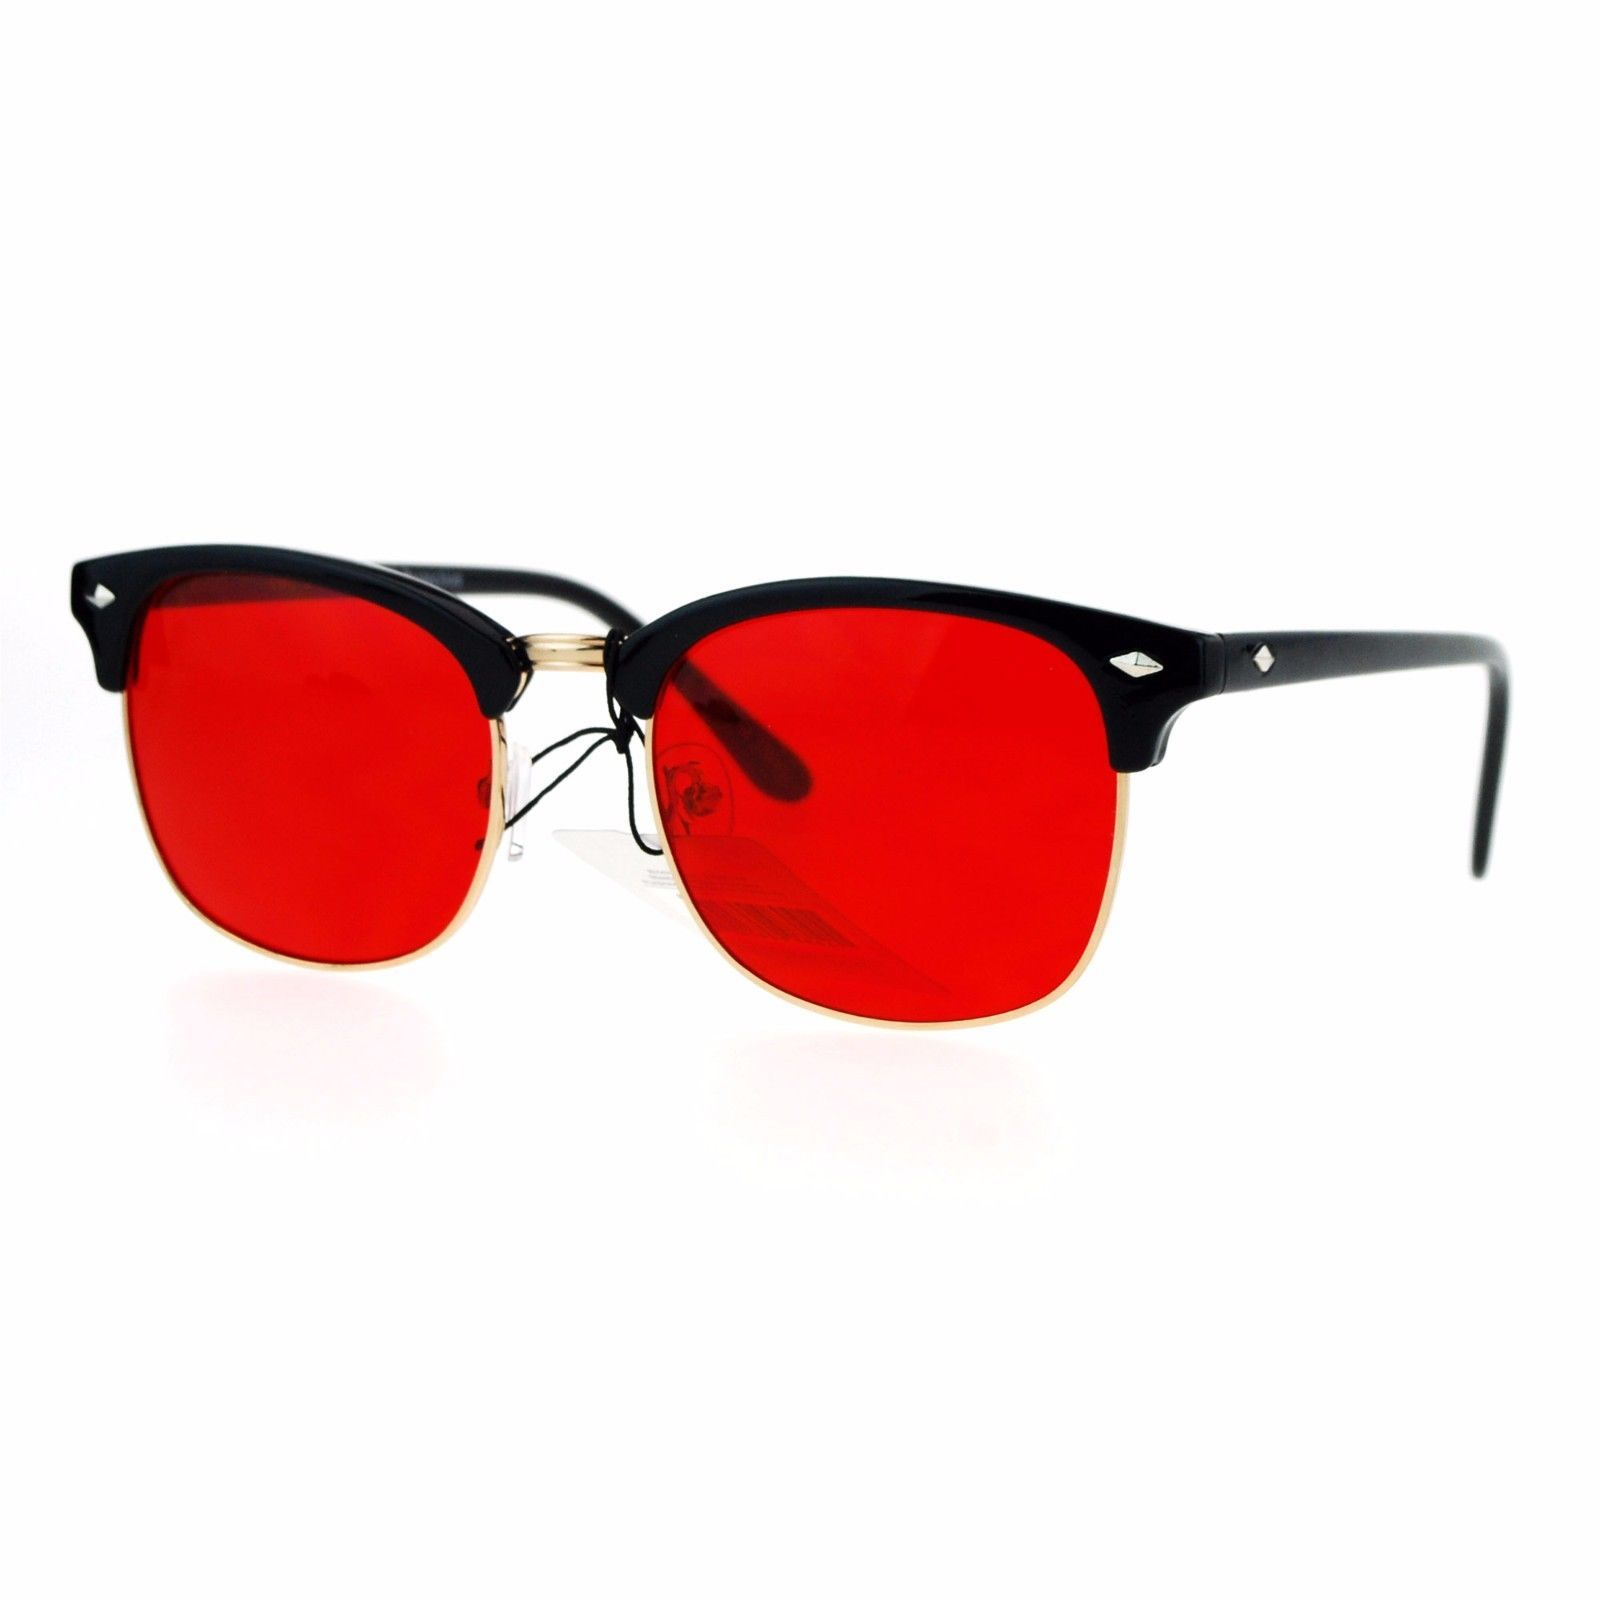 Color Lens Sunglasses Square Black Top Horn Rim Unisex Fashion UV 400